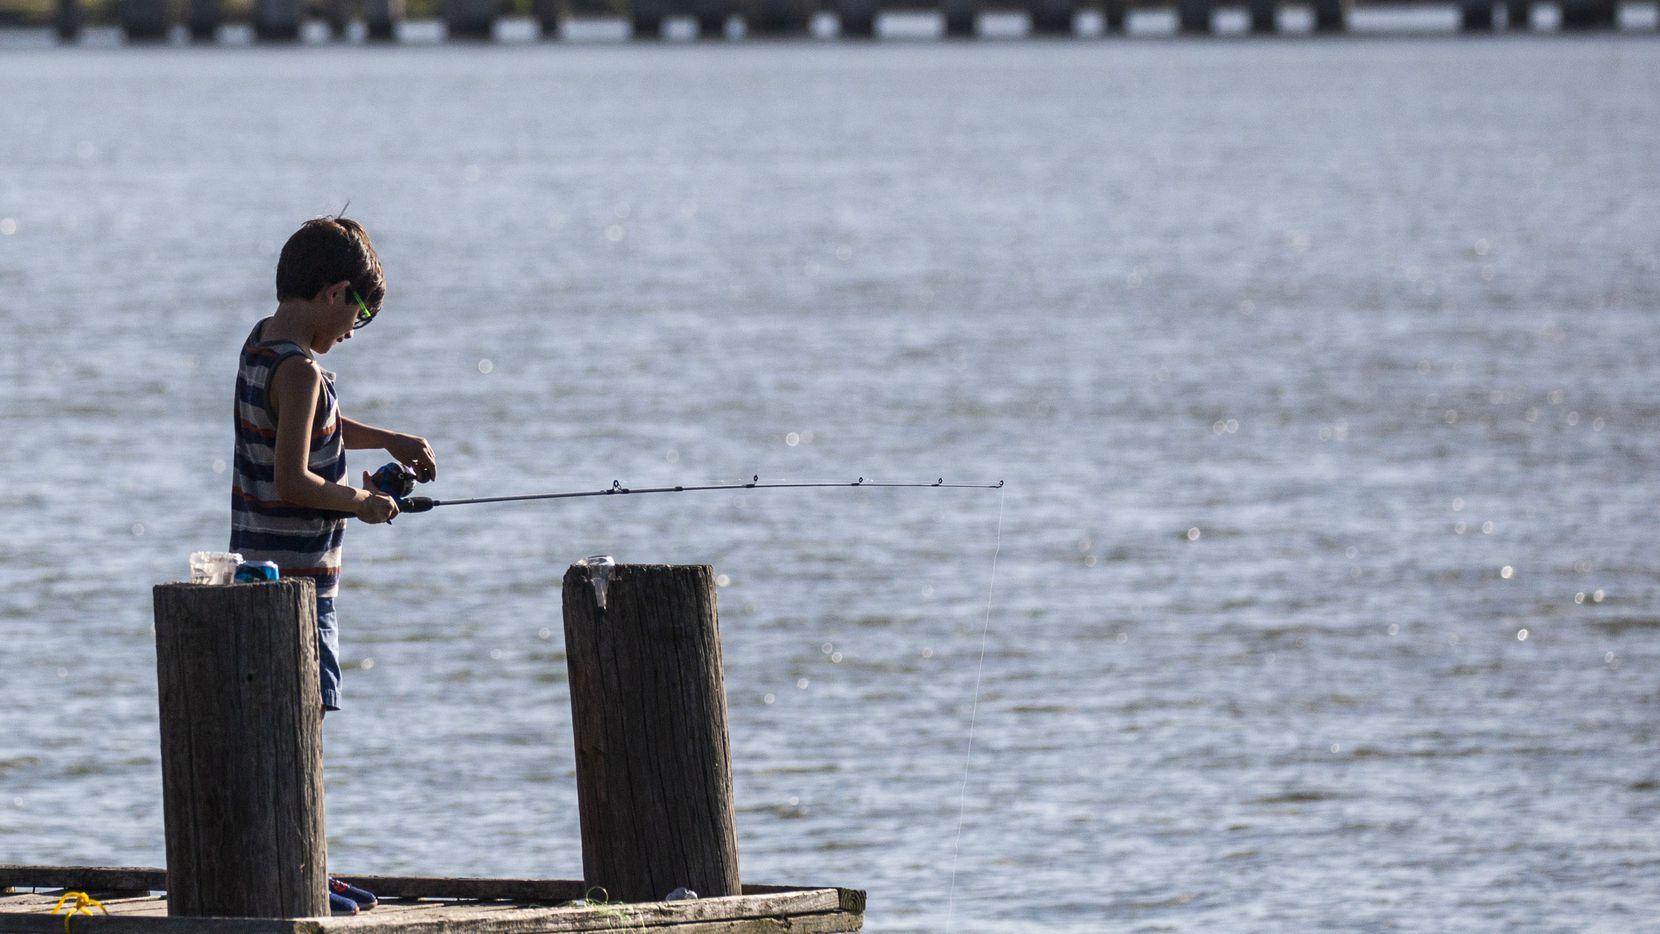 Jovanni Ledezma, 7, fishes from a pier at John Paul Jones Park along Lake Ray Hubbard in Garland, Texas, on Saturday, July 18, 2020.